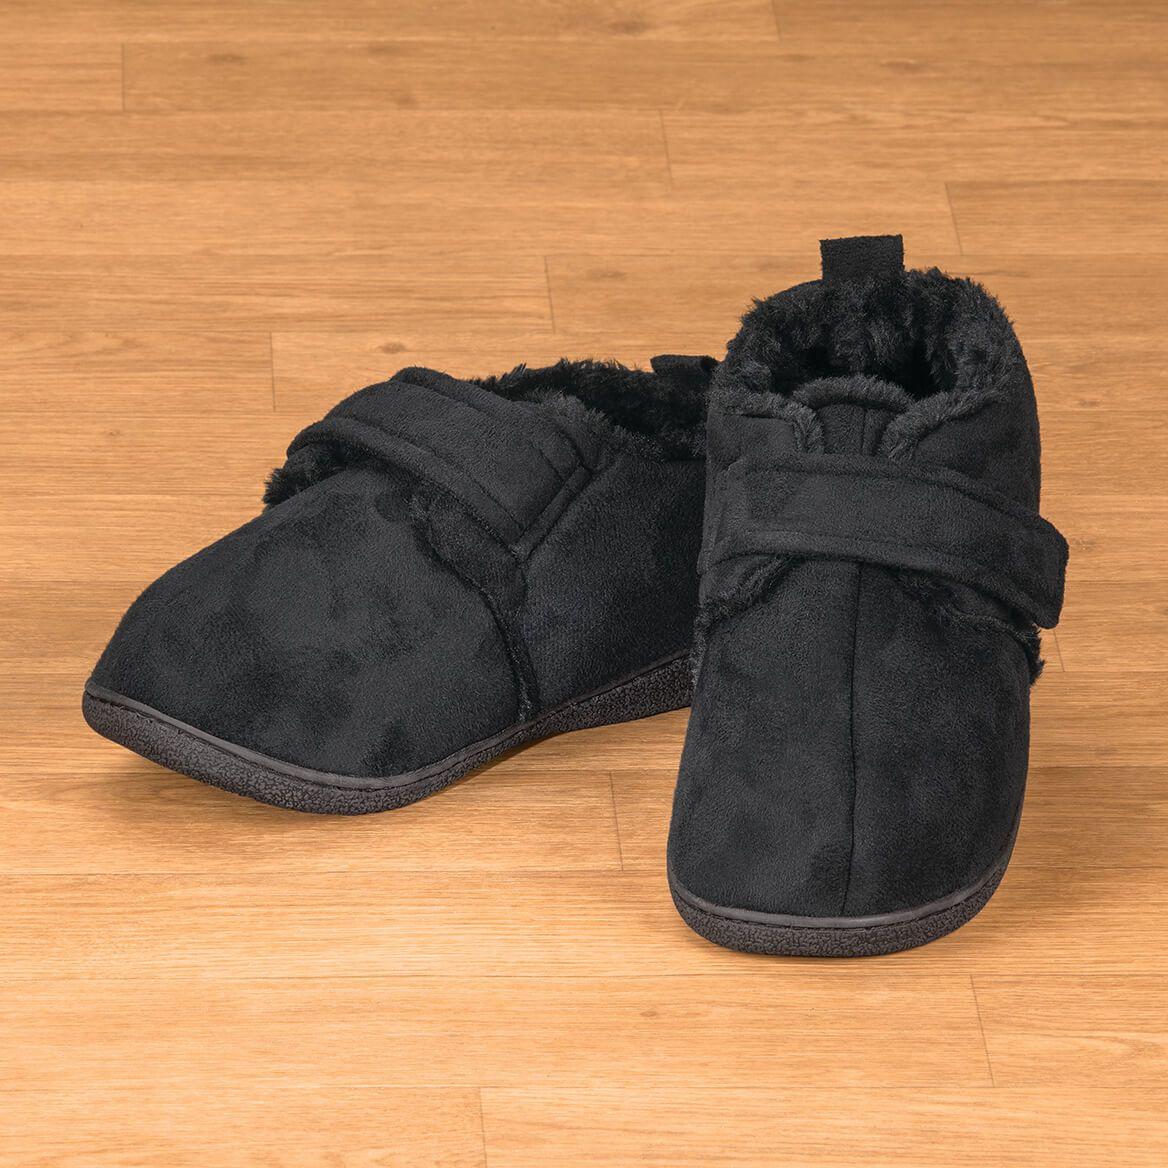 Diabetic Comfort Slippers Mens-369906